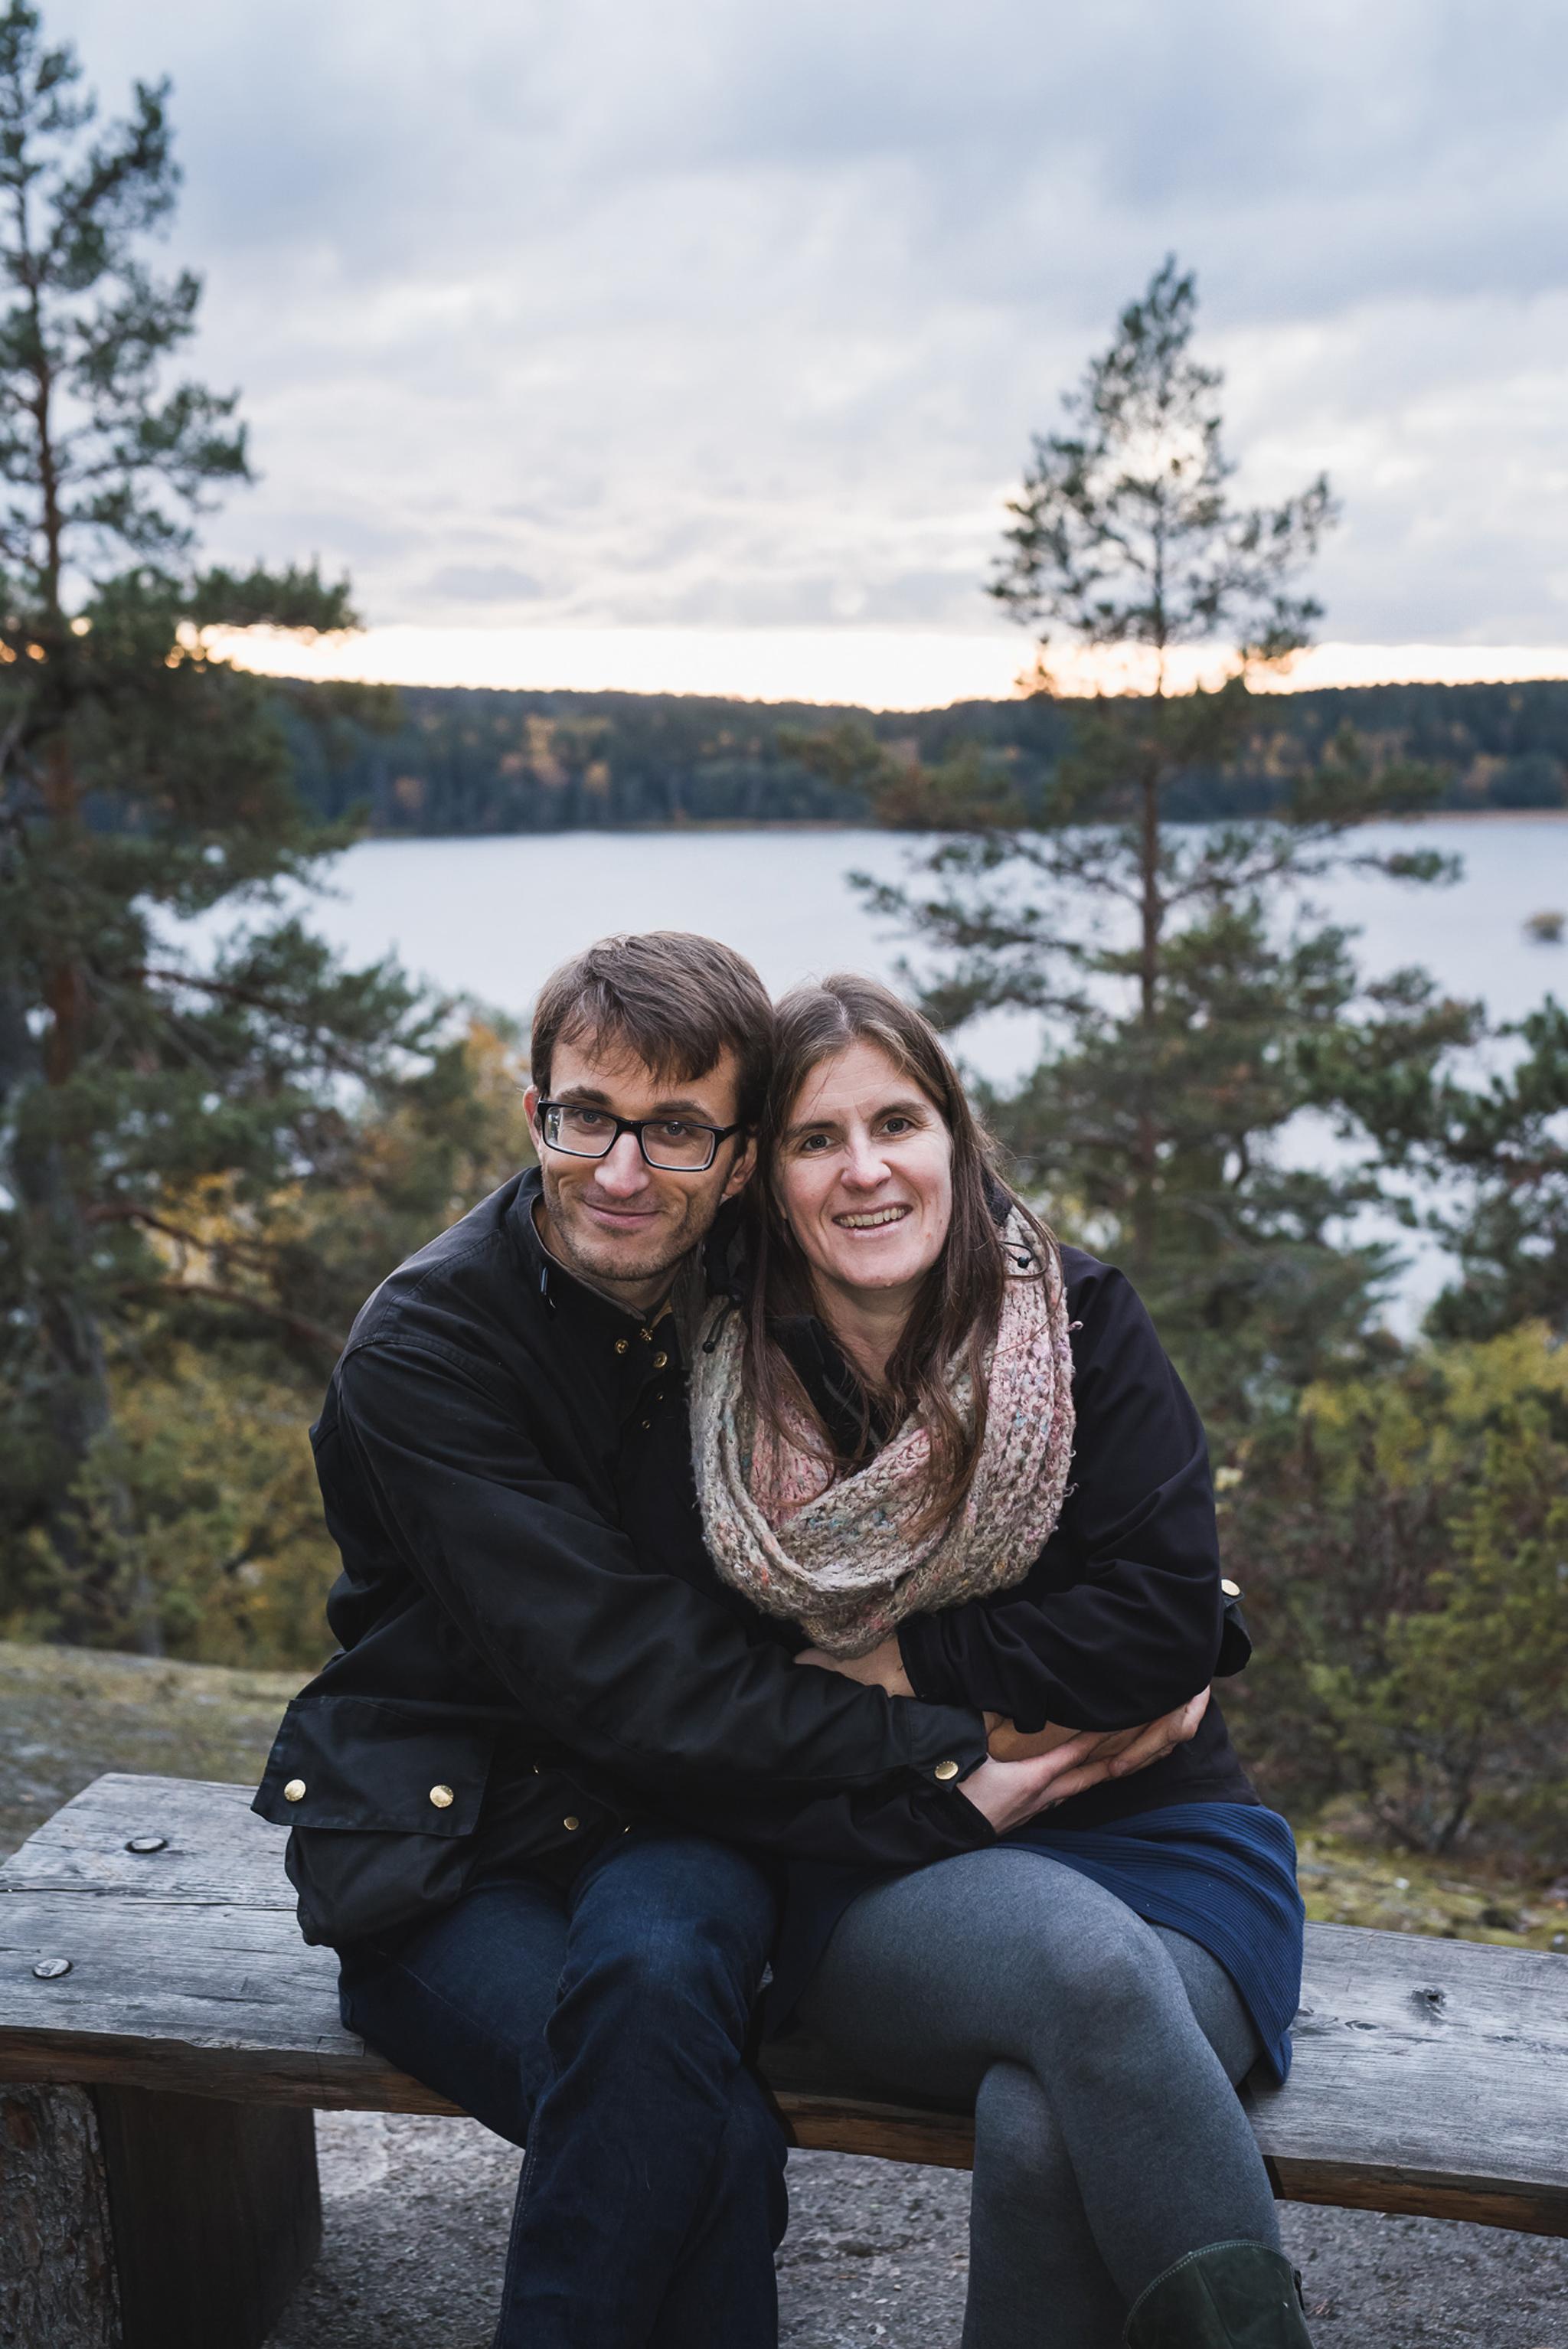 016-familjefotograf-upplands-vasby-sollentuna-taby-vallentuna-sigtuna-marsta